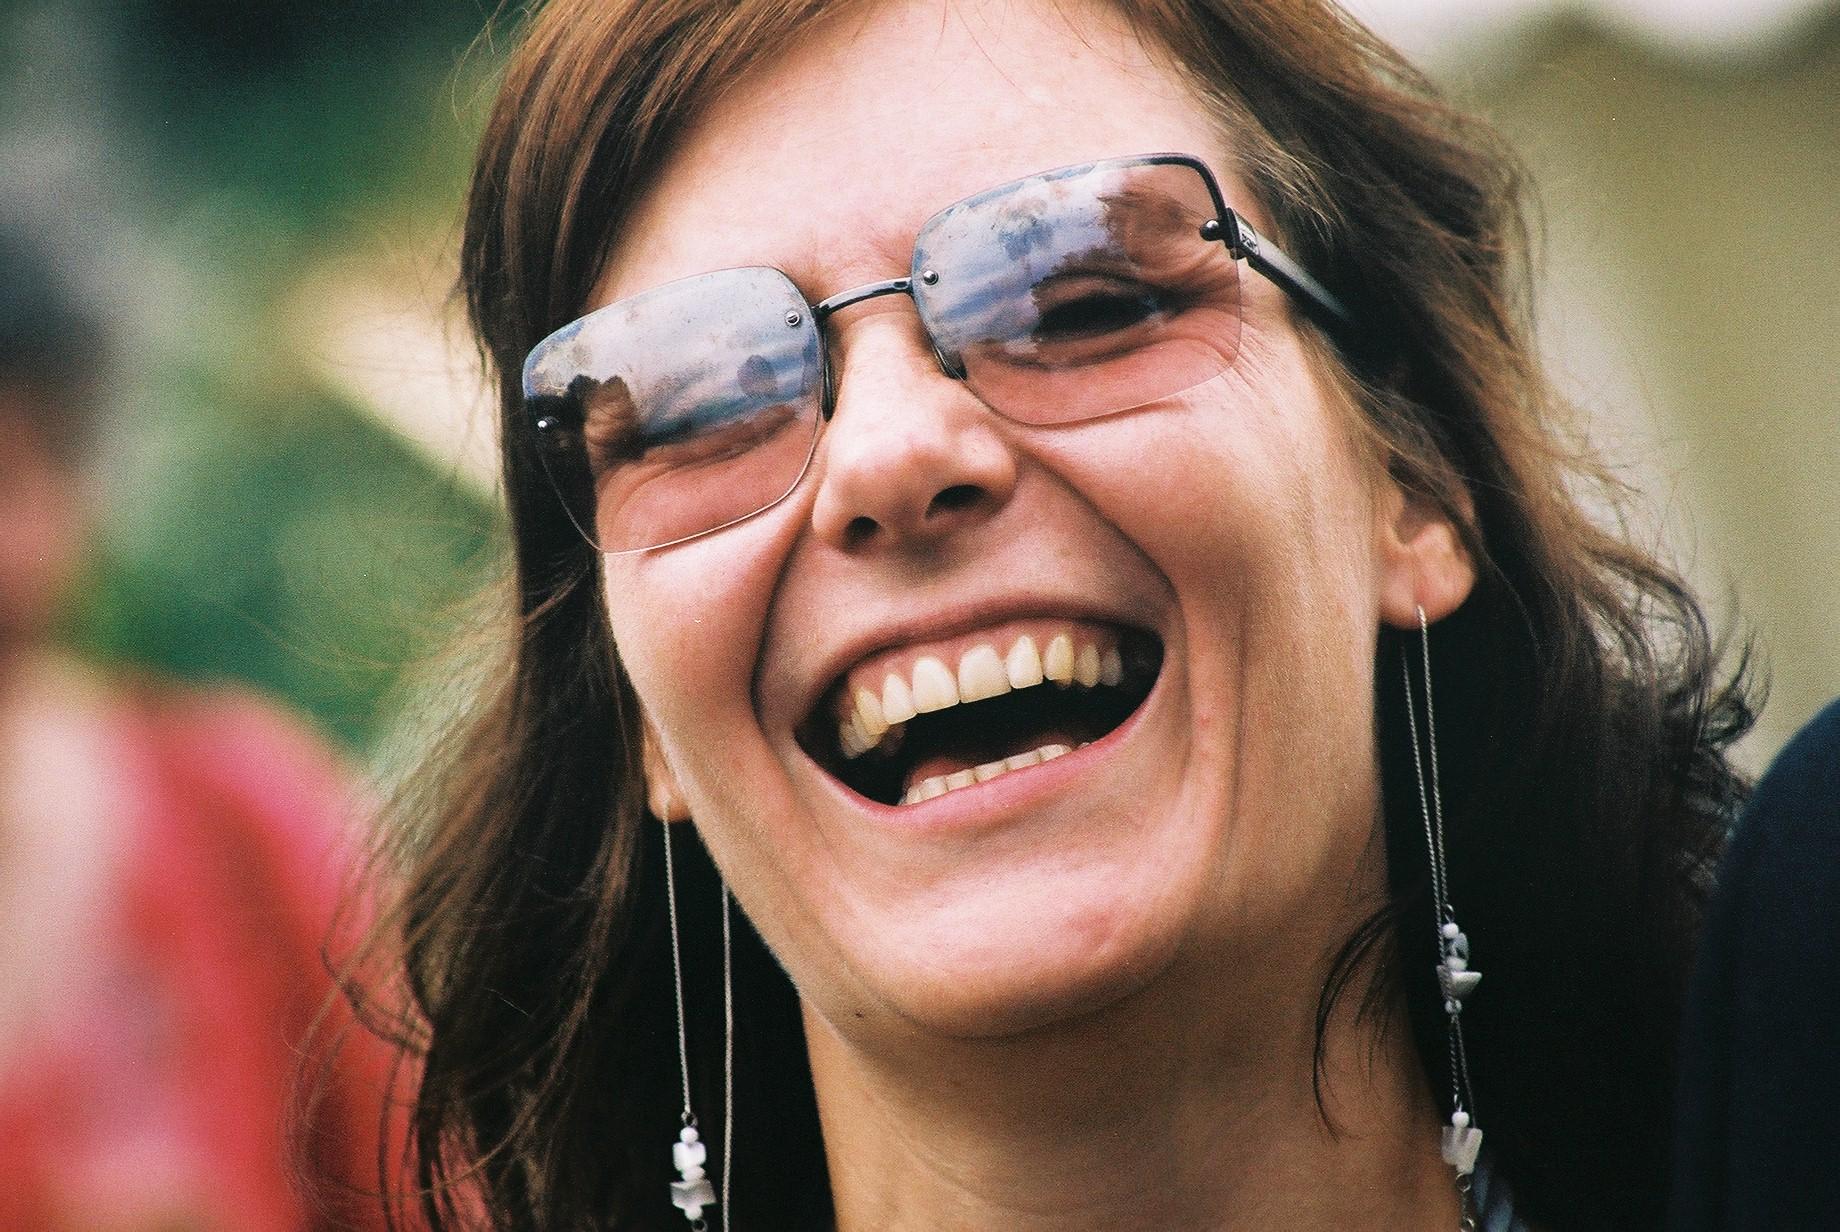 Elaine Laughing.JPG